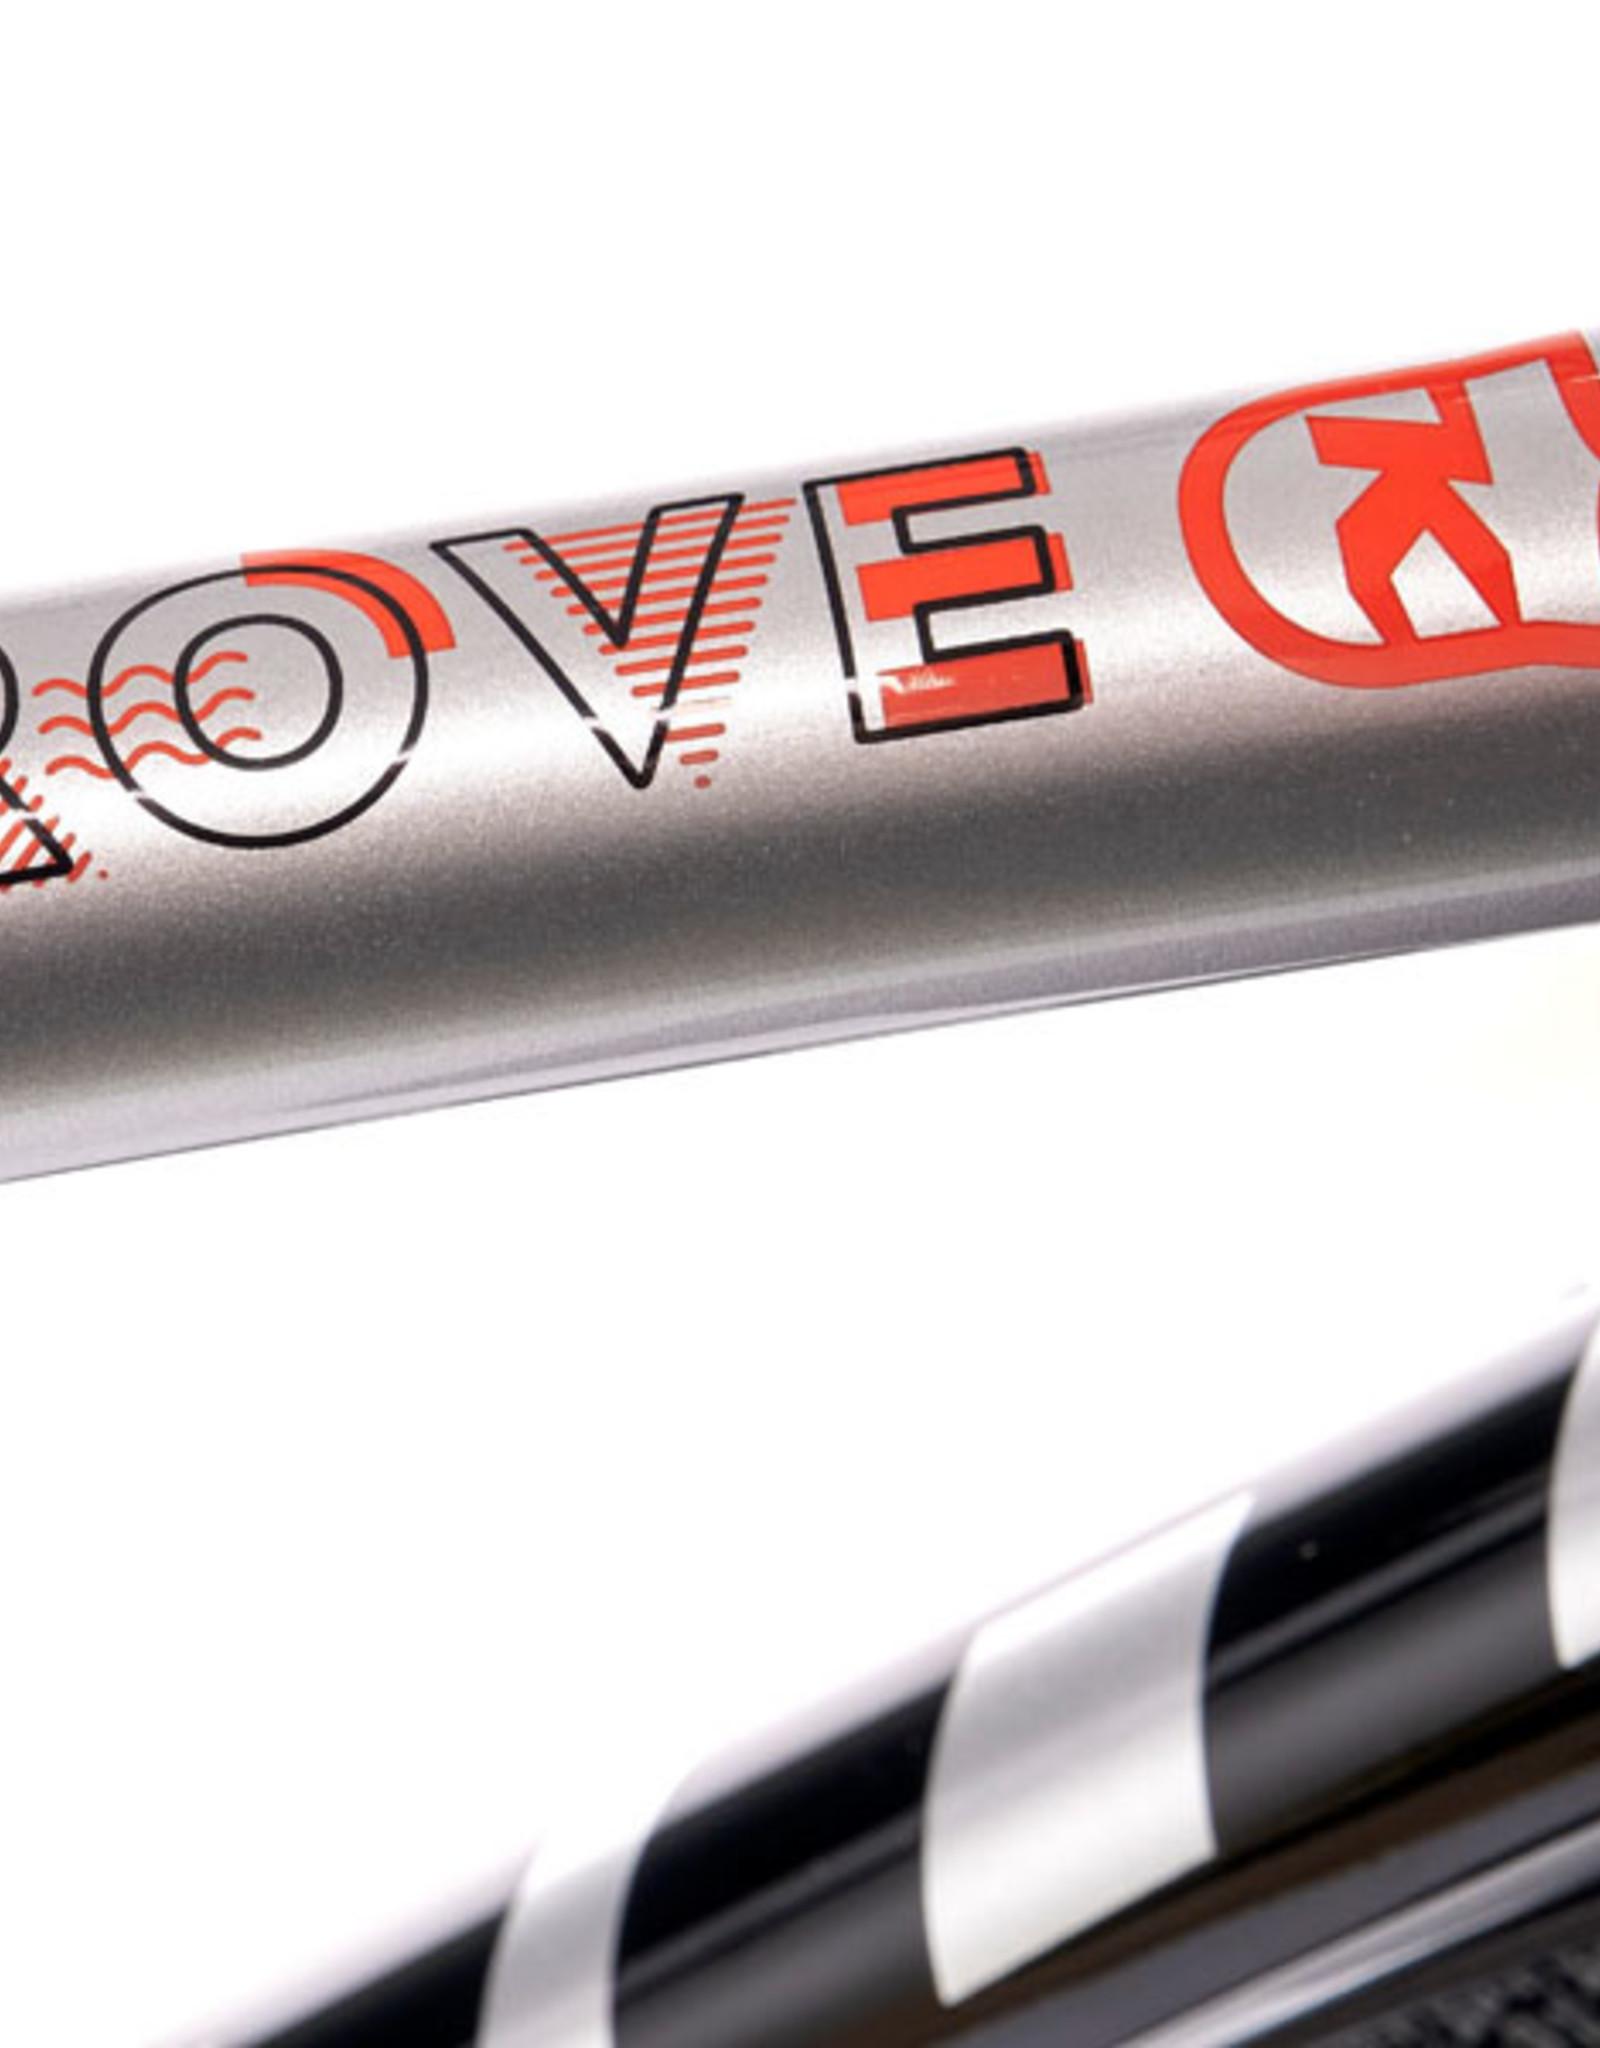 KONA Rove 2021 Silver/ Black Decal  56cm